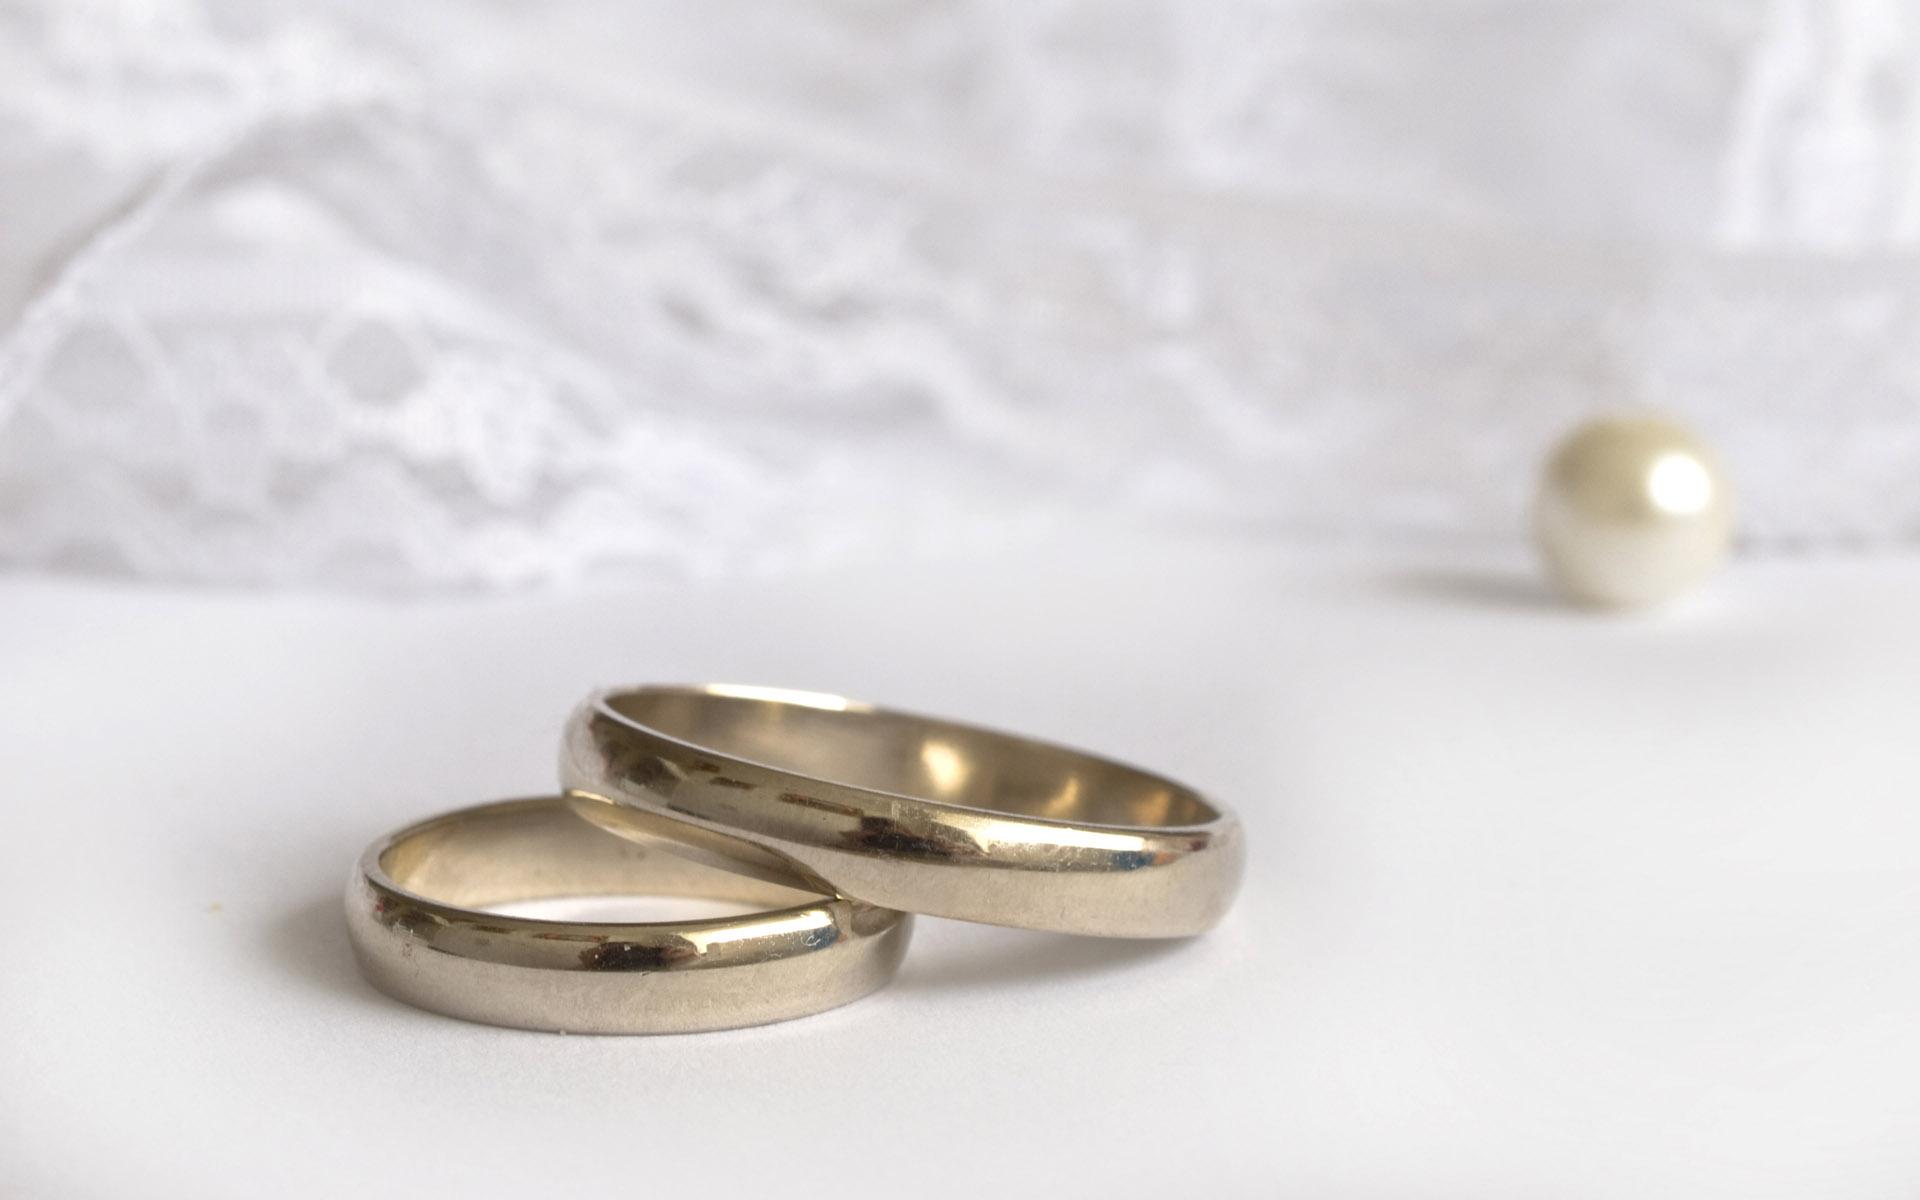 Wedding Ring Wallpaper - WallpaperSafari